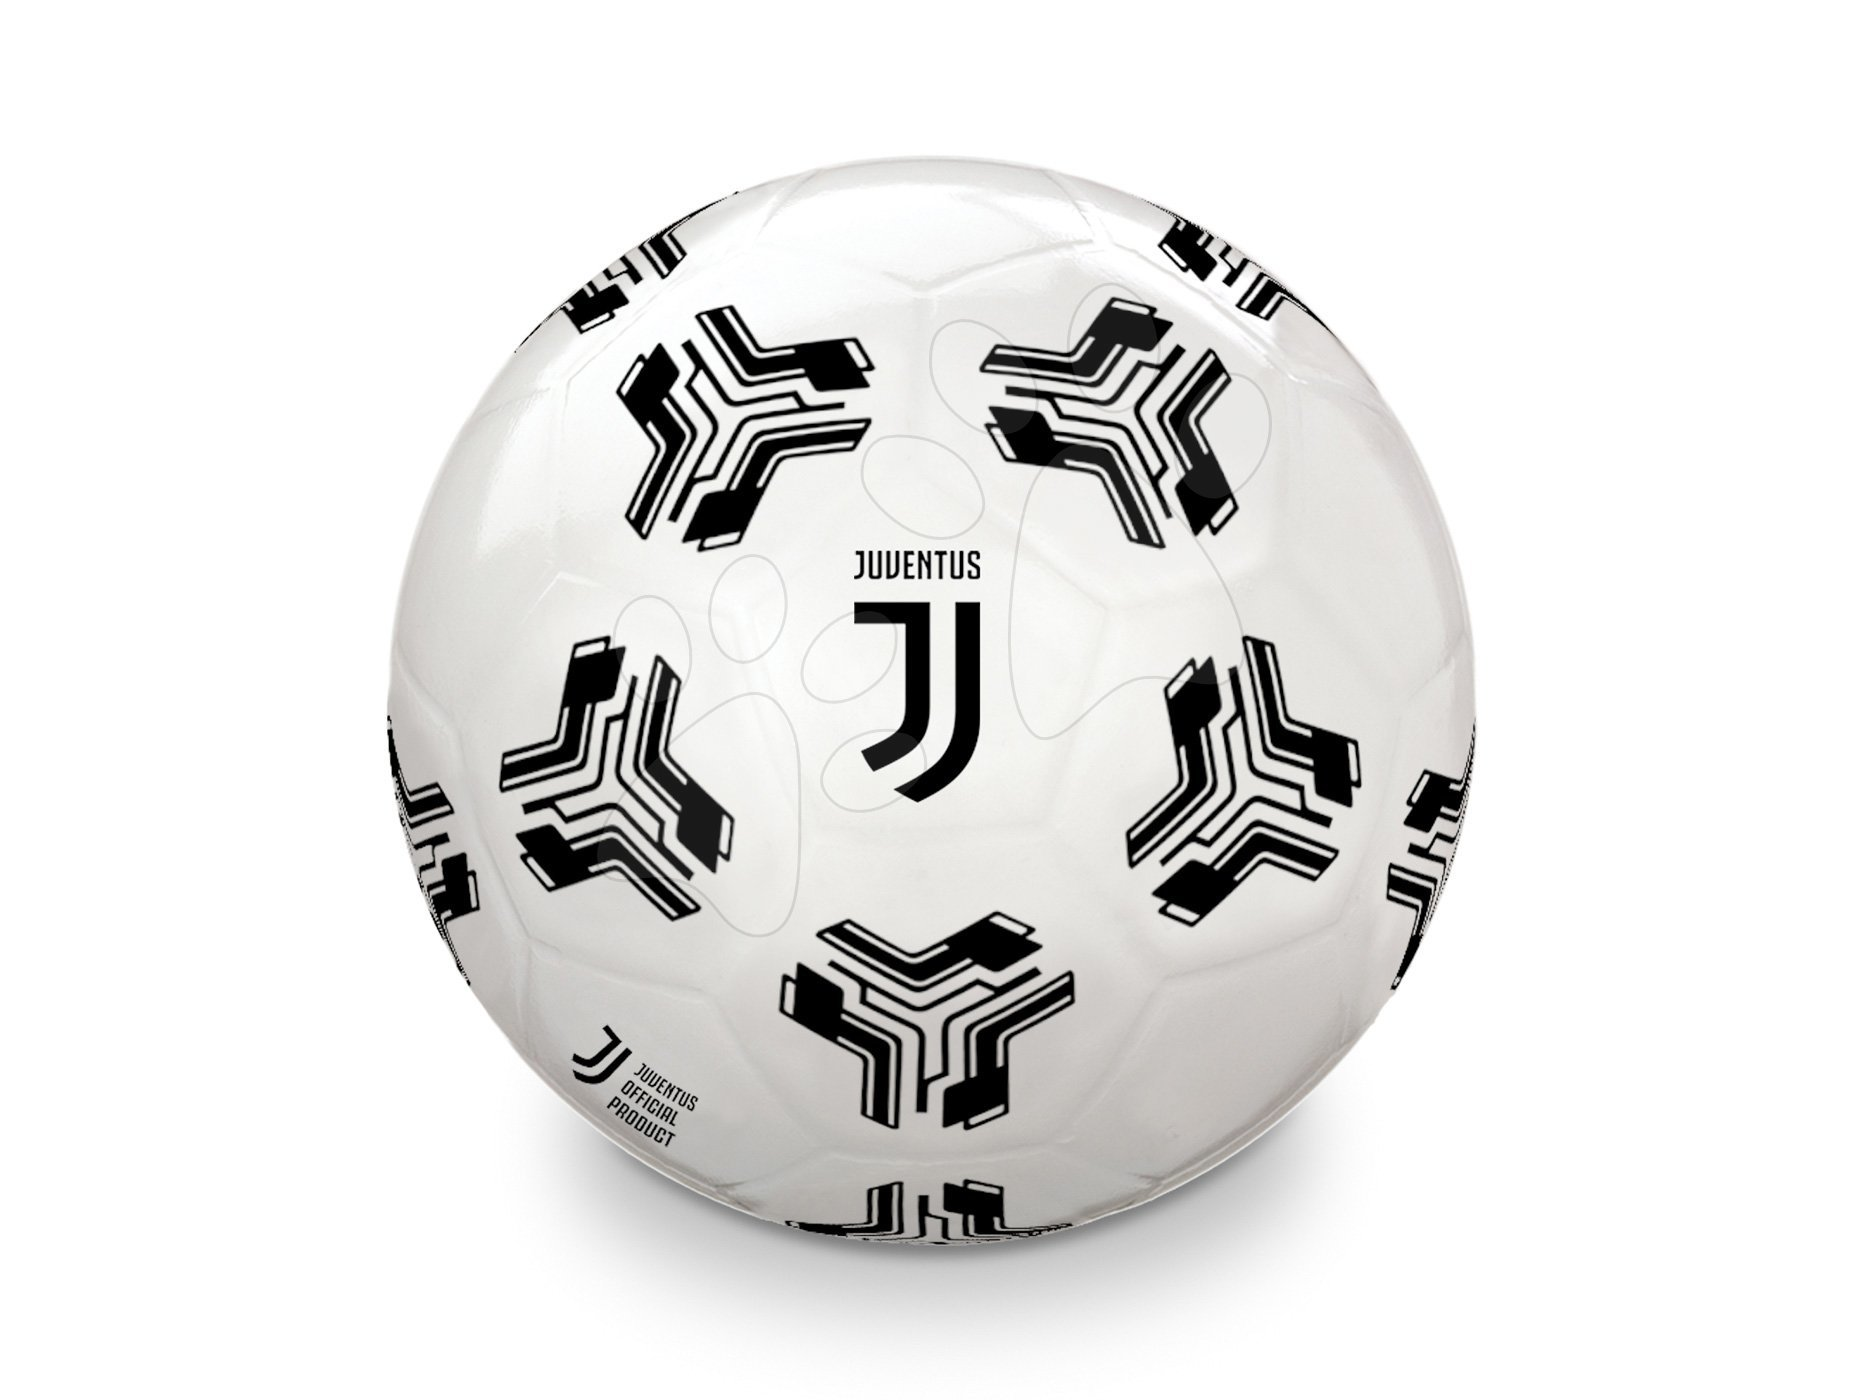 Fotbalový míč gumový F.C. Juventus Mondo velikost 230 mm